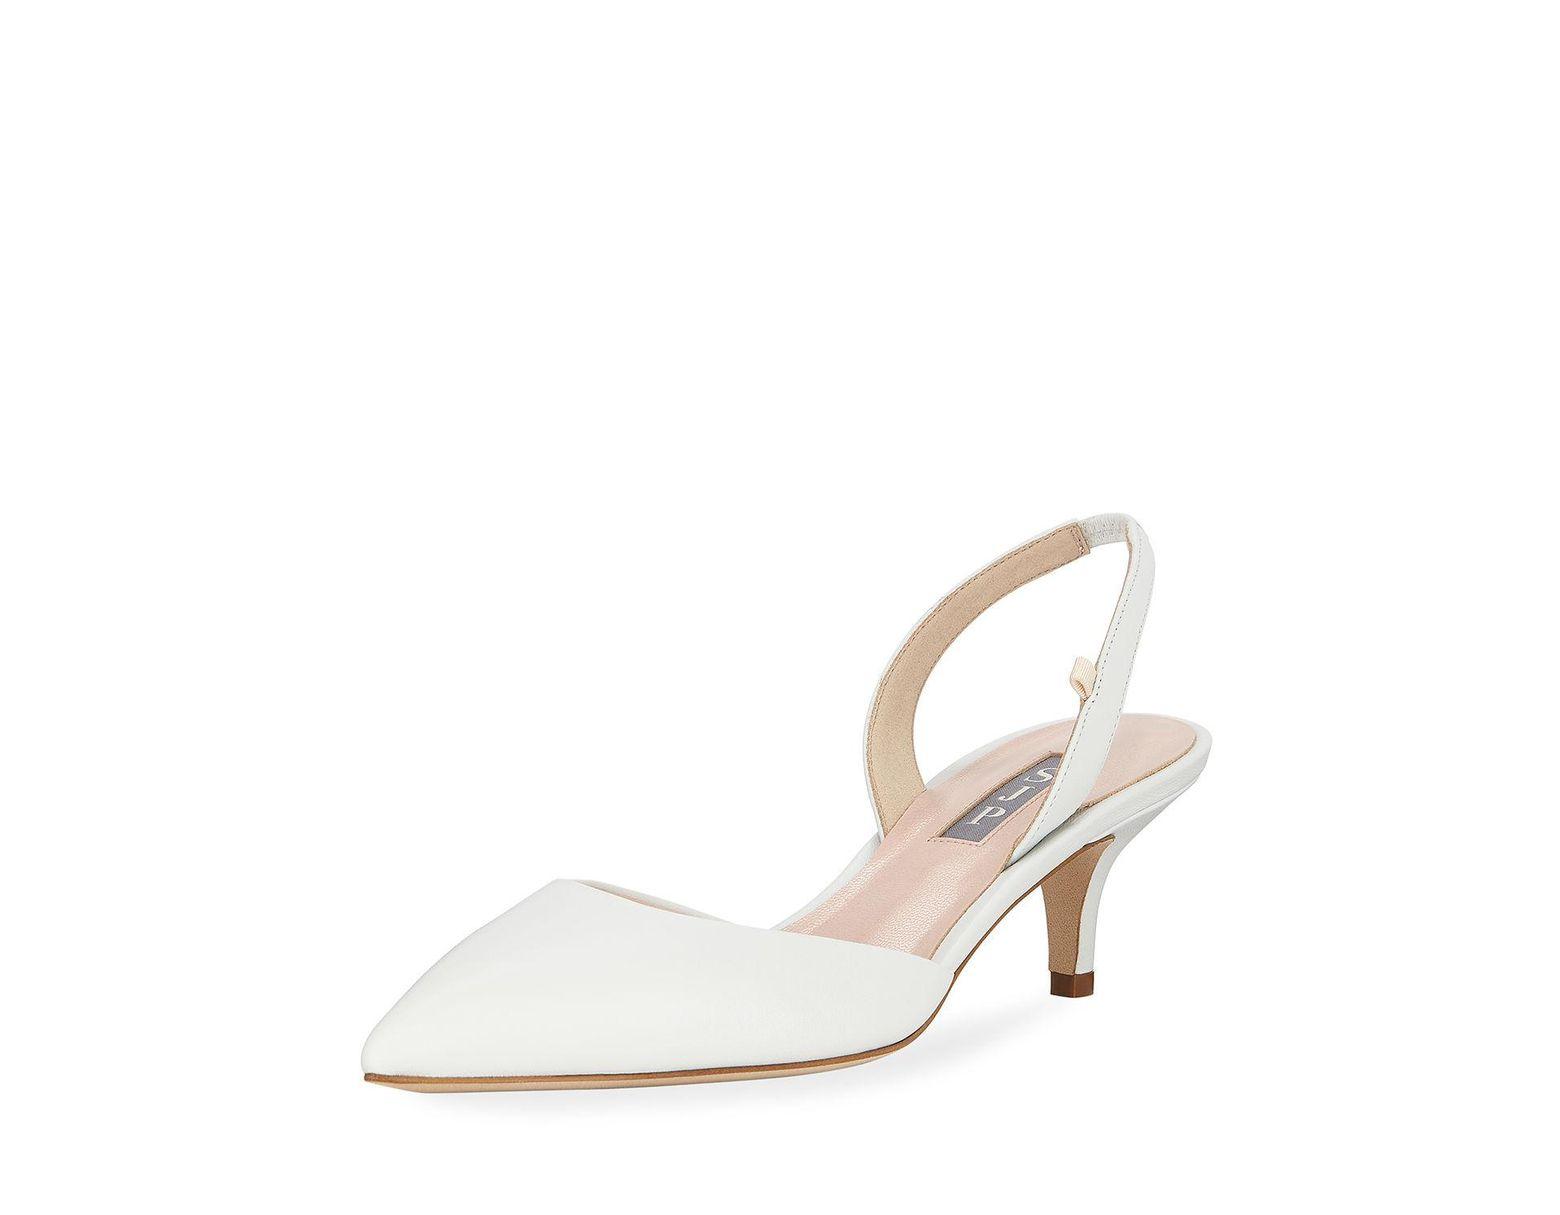 cc97470672 SJP by Sarah Jessica Parker Bliss Metallic Kitten-heel Slingback Pumps in  White - Lyst